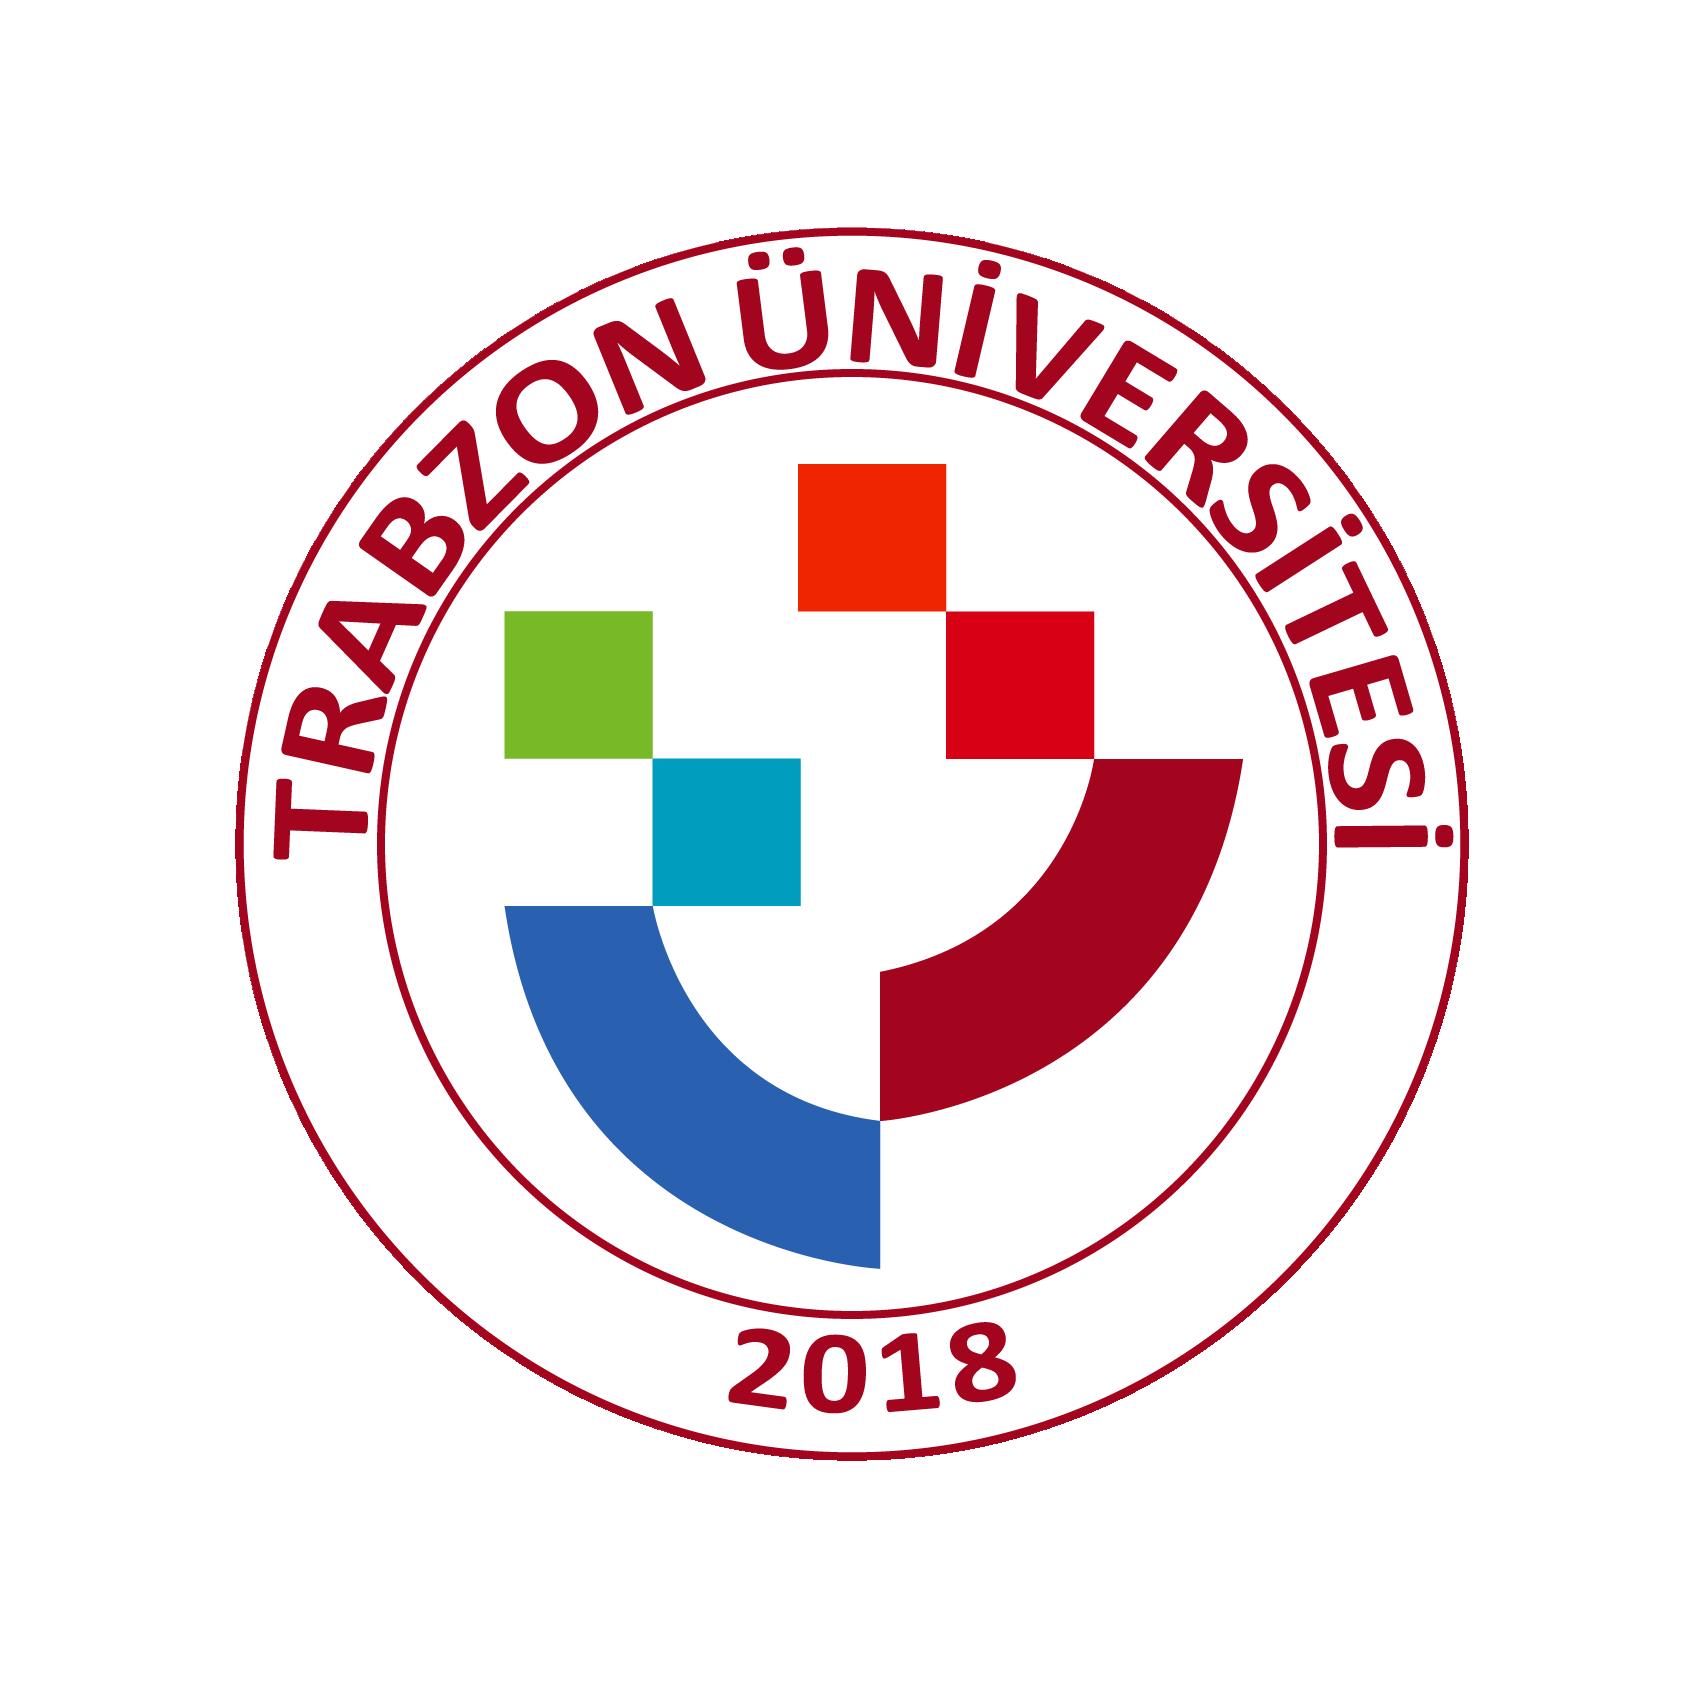 Trabzon Üniversitesi yjty t